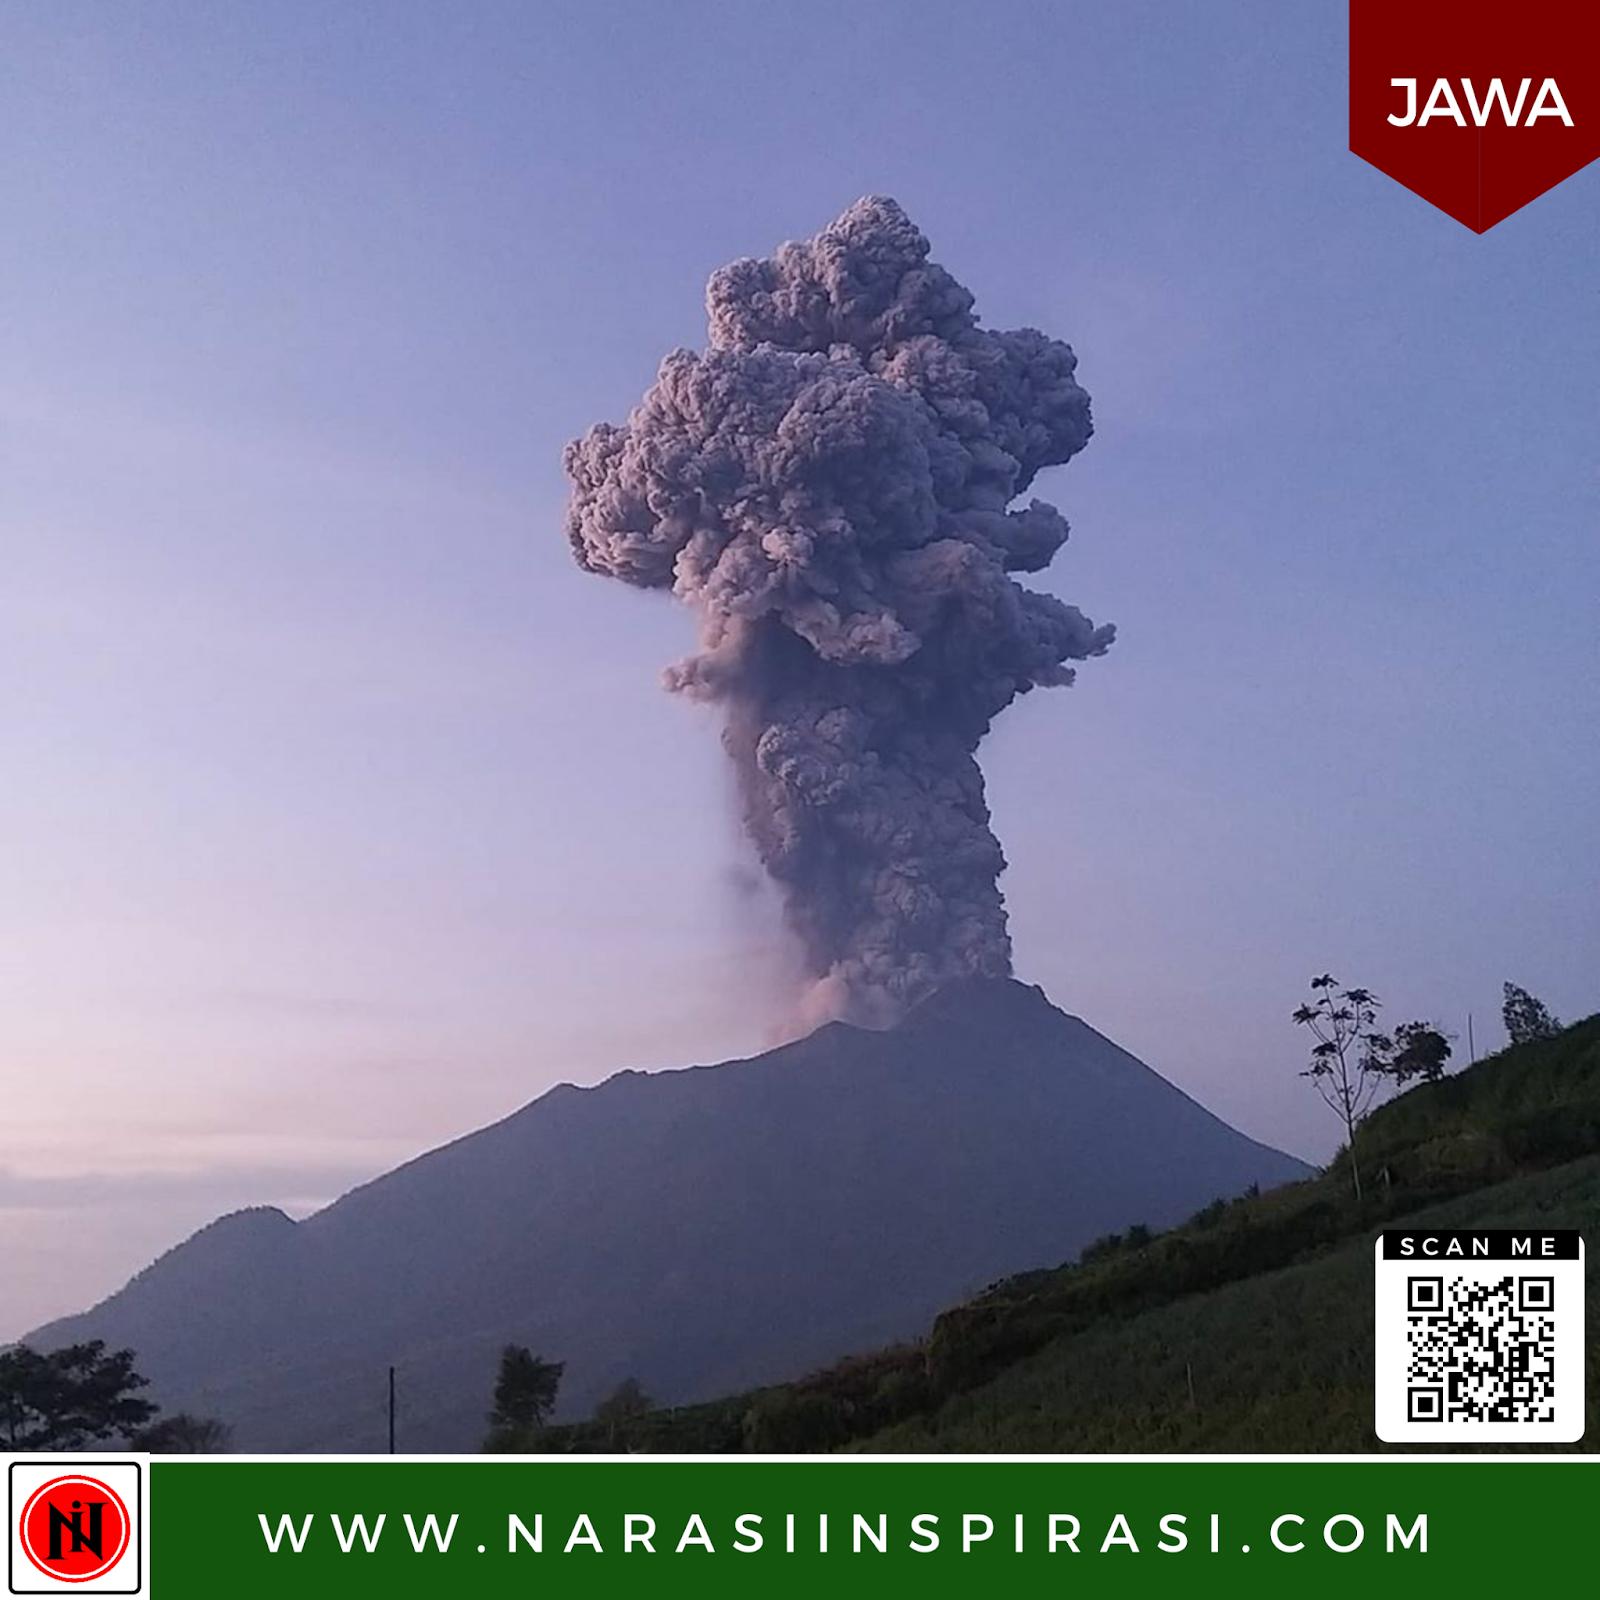 Sabdo Palon Noyo Genggong Sang Among Rogo Ramalan Jawa Kuno Tentang Kejayaan Nusantara Narasi Inspirasi